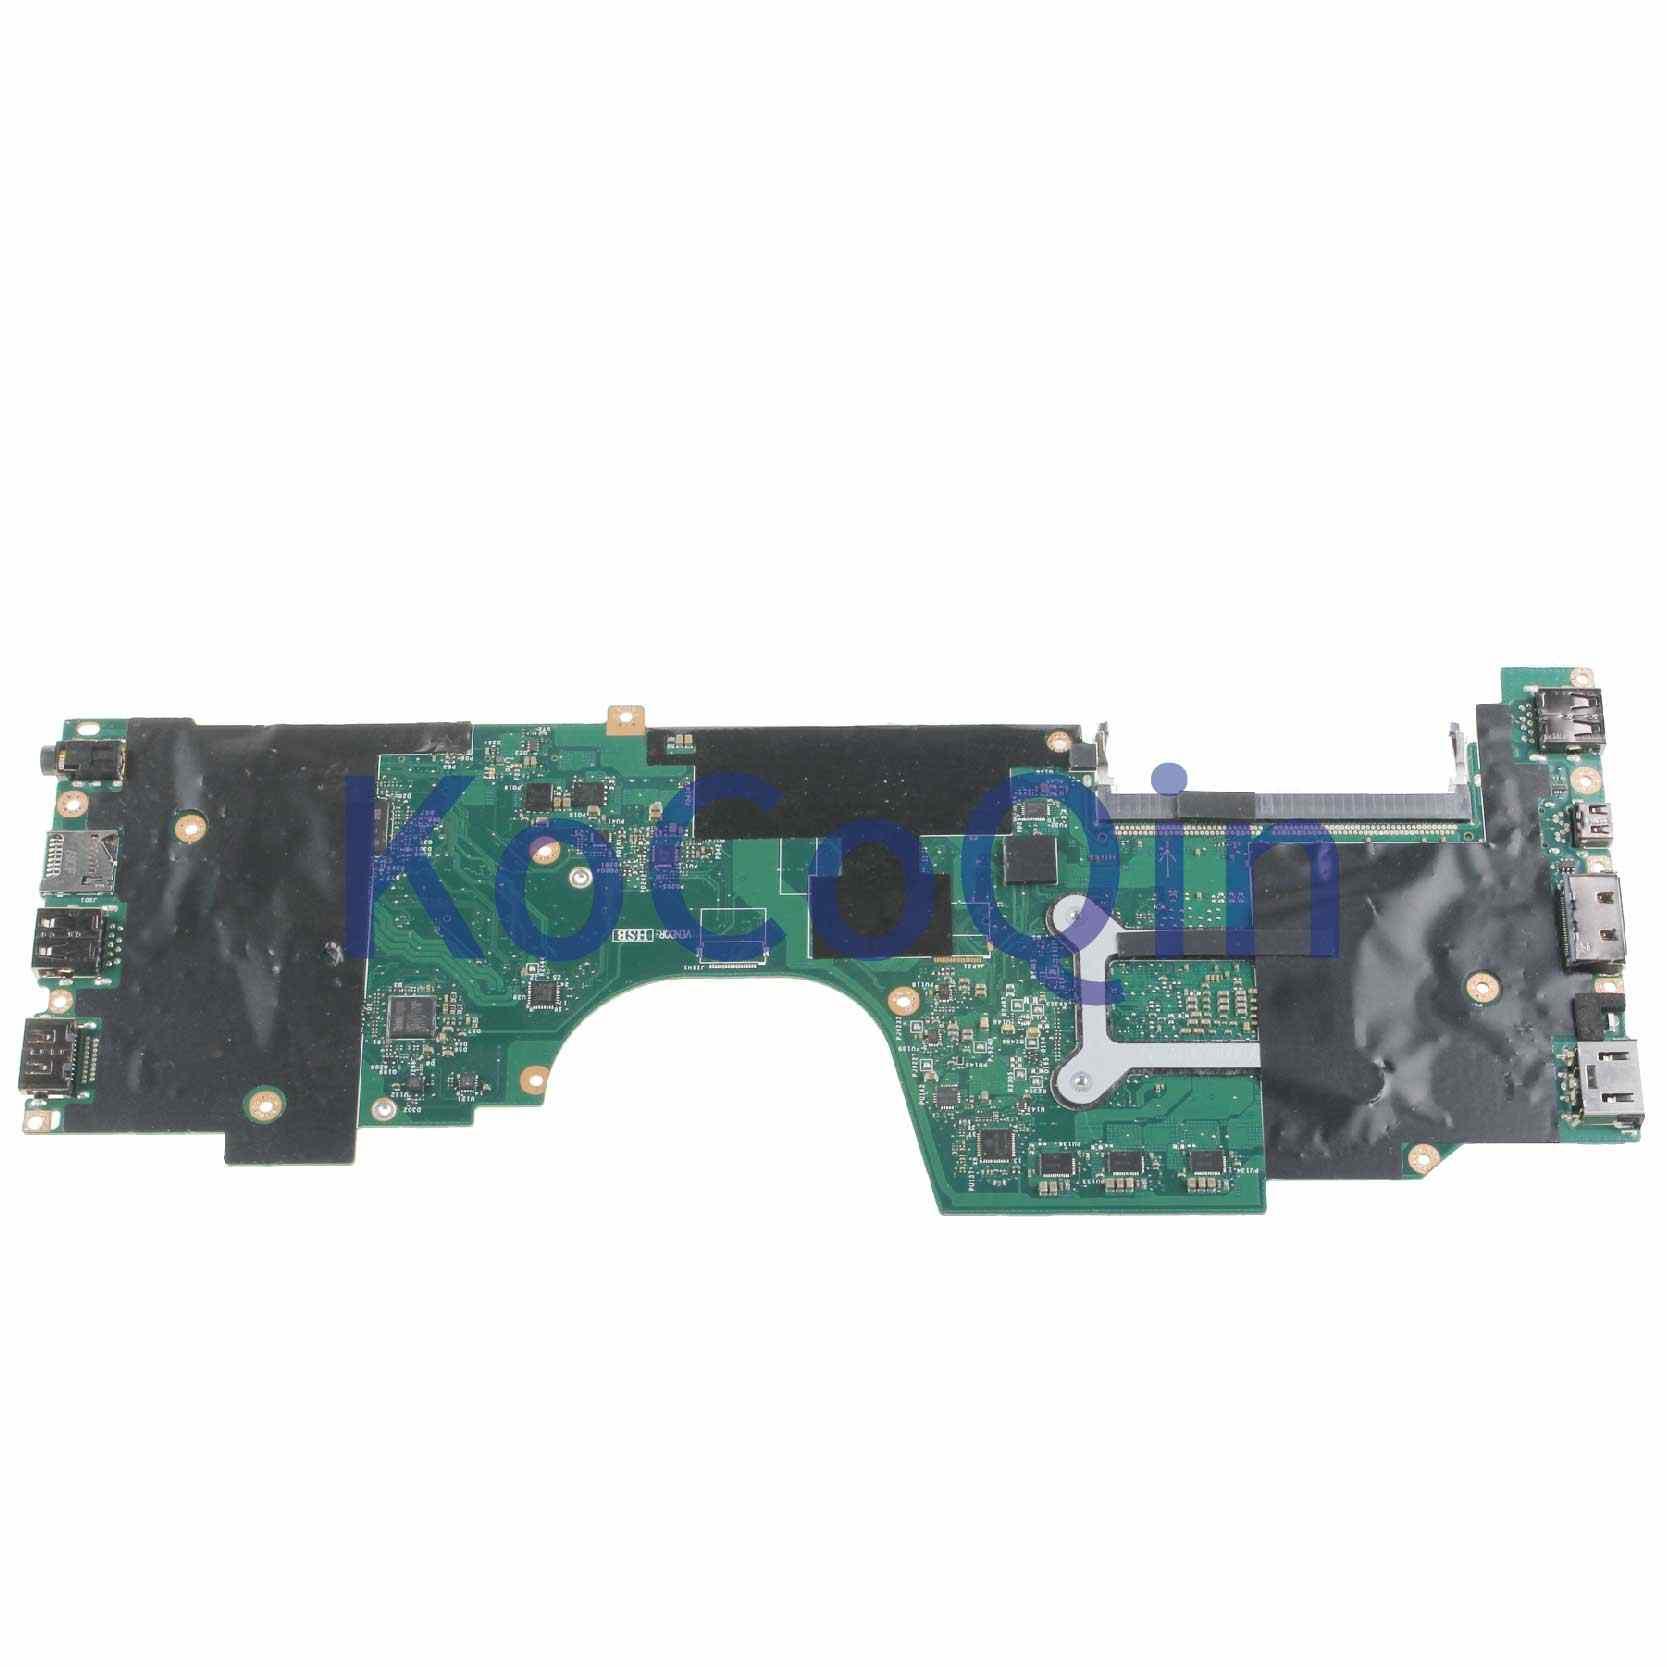 KoCoQin Laptop motherboard Für LENOVO ThinkPad YOGA 260 I7 Mainboard SR2EZ AIZS1 LA-C581P I7 CPU